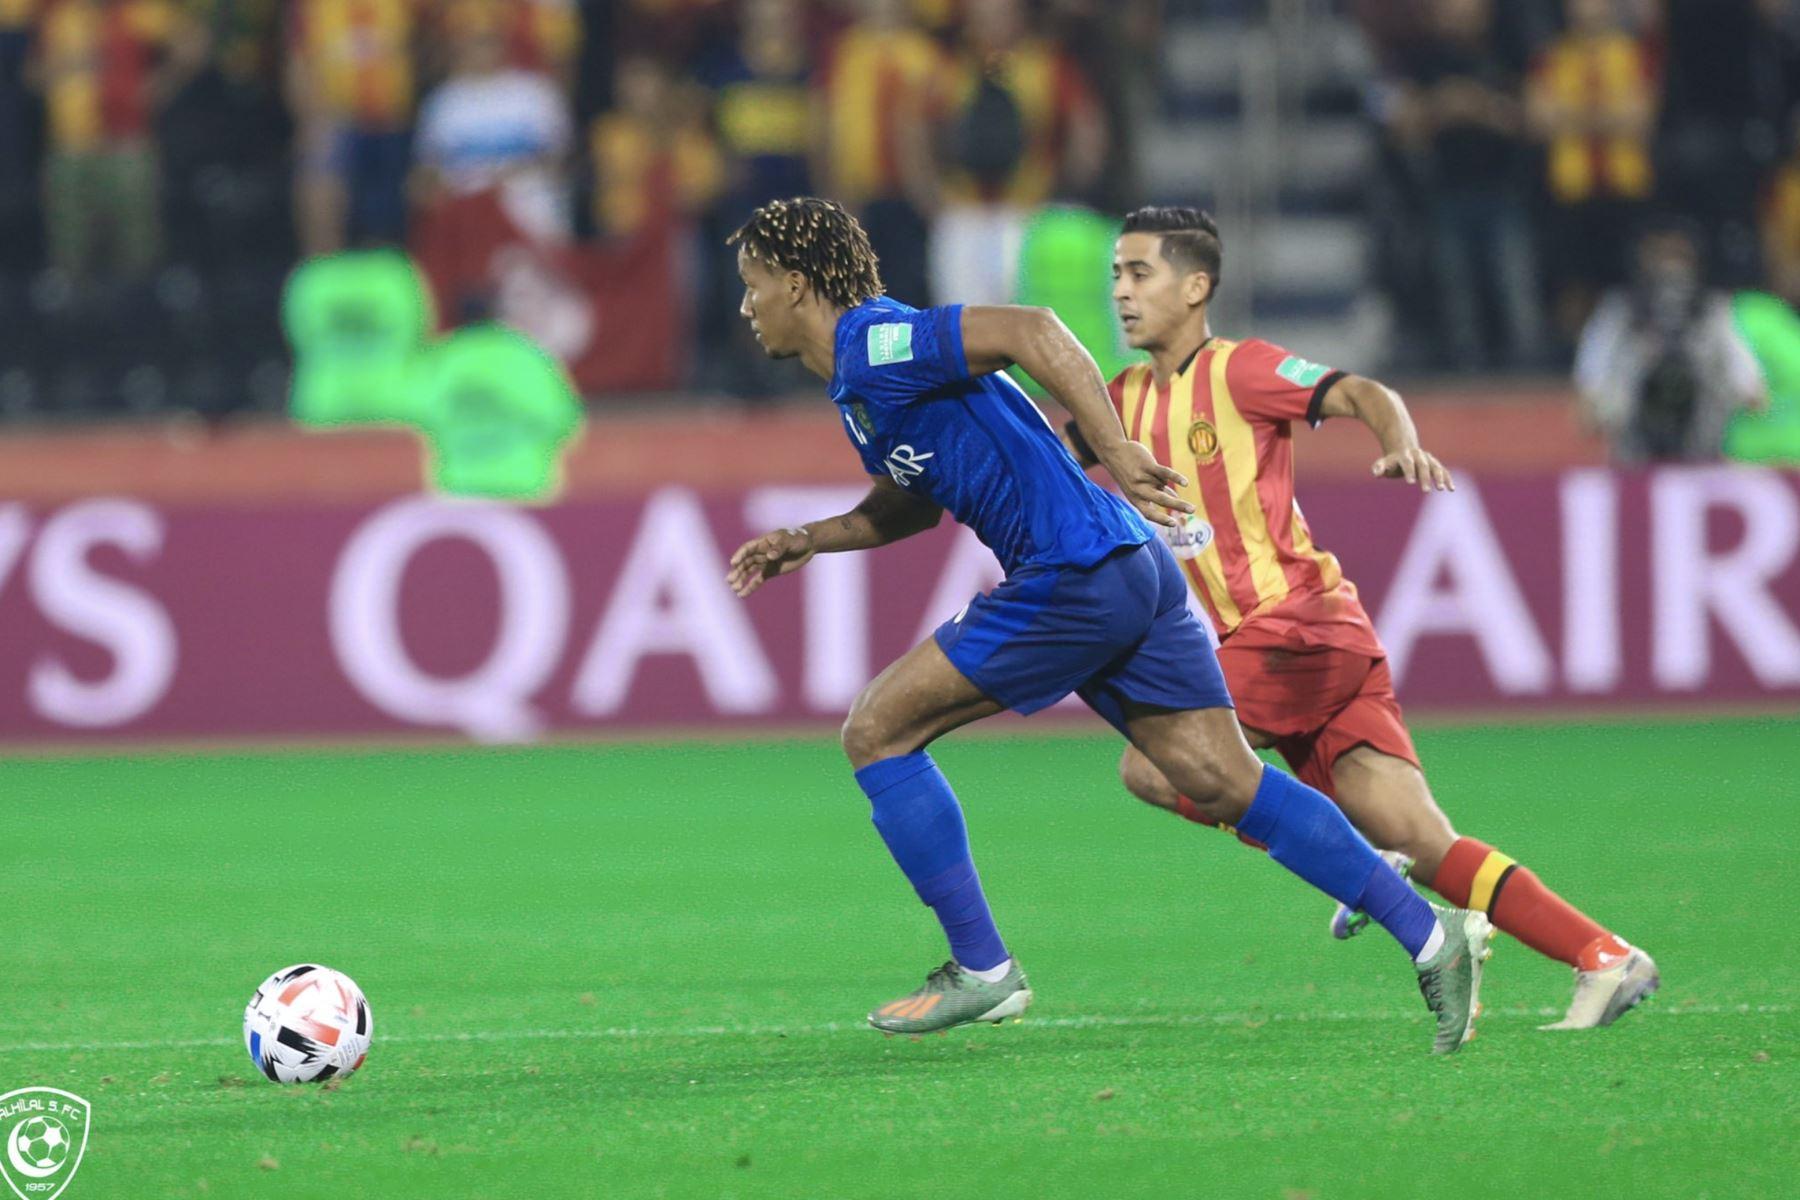 Al-Hilal derrotó por la mínima diferencia al Esperance de Tunis. El único gol del encuentro lo realizó Bafetimbi Gomis a pase de André Carrill. Foto: Twitter Al-Hilal